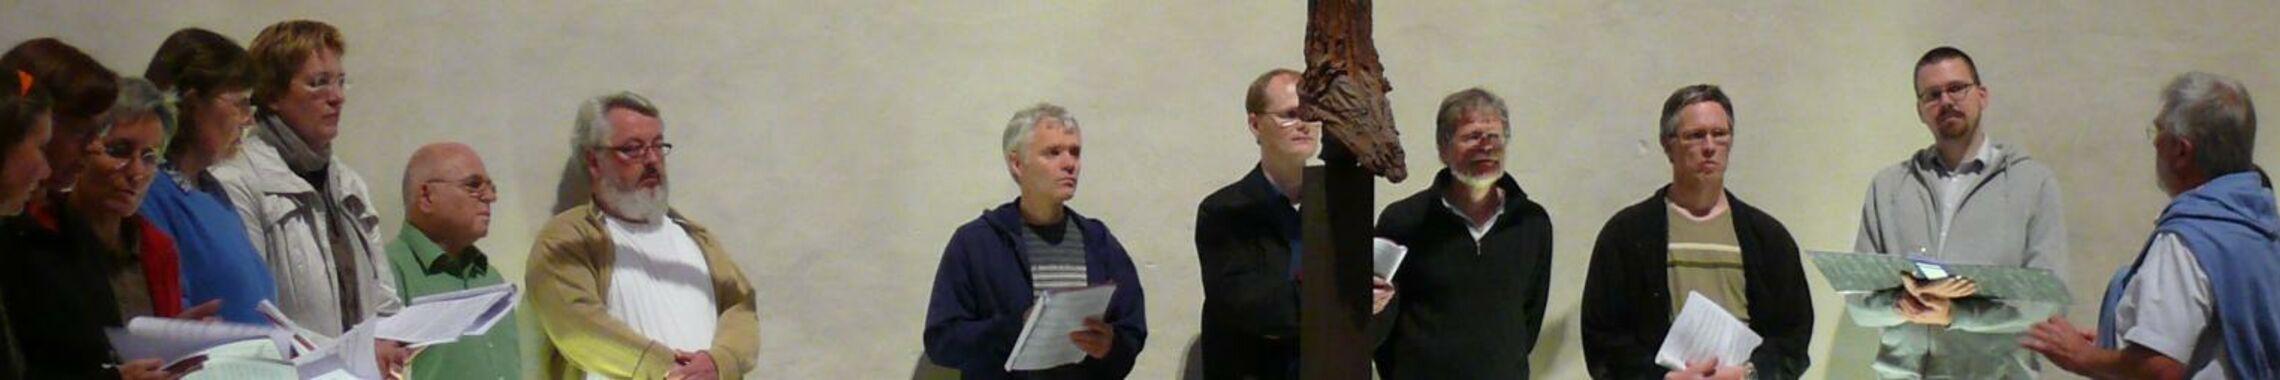 AGL-Seminar in Michaeliskirche